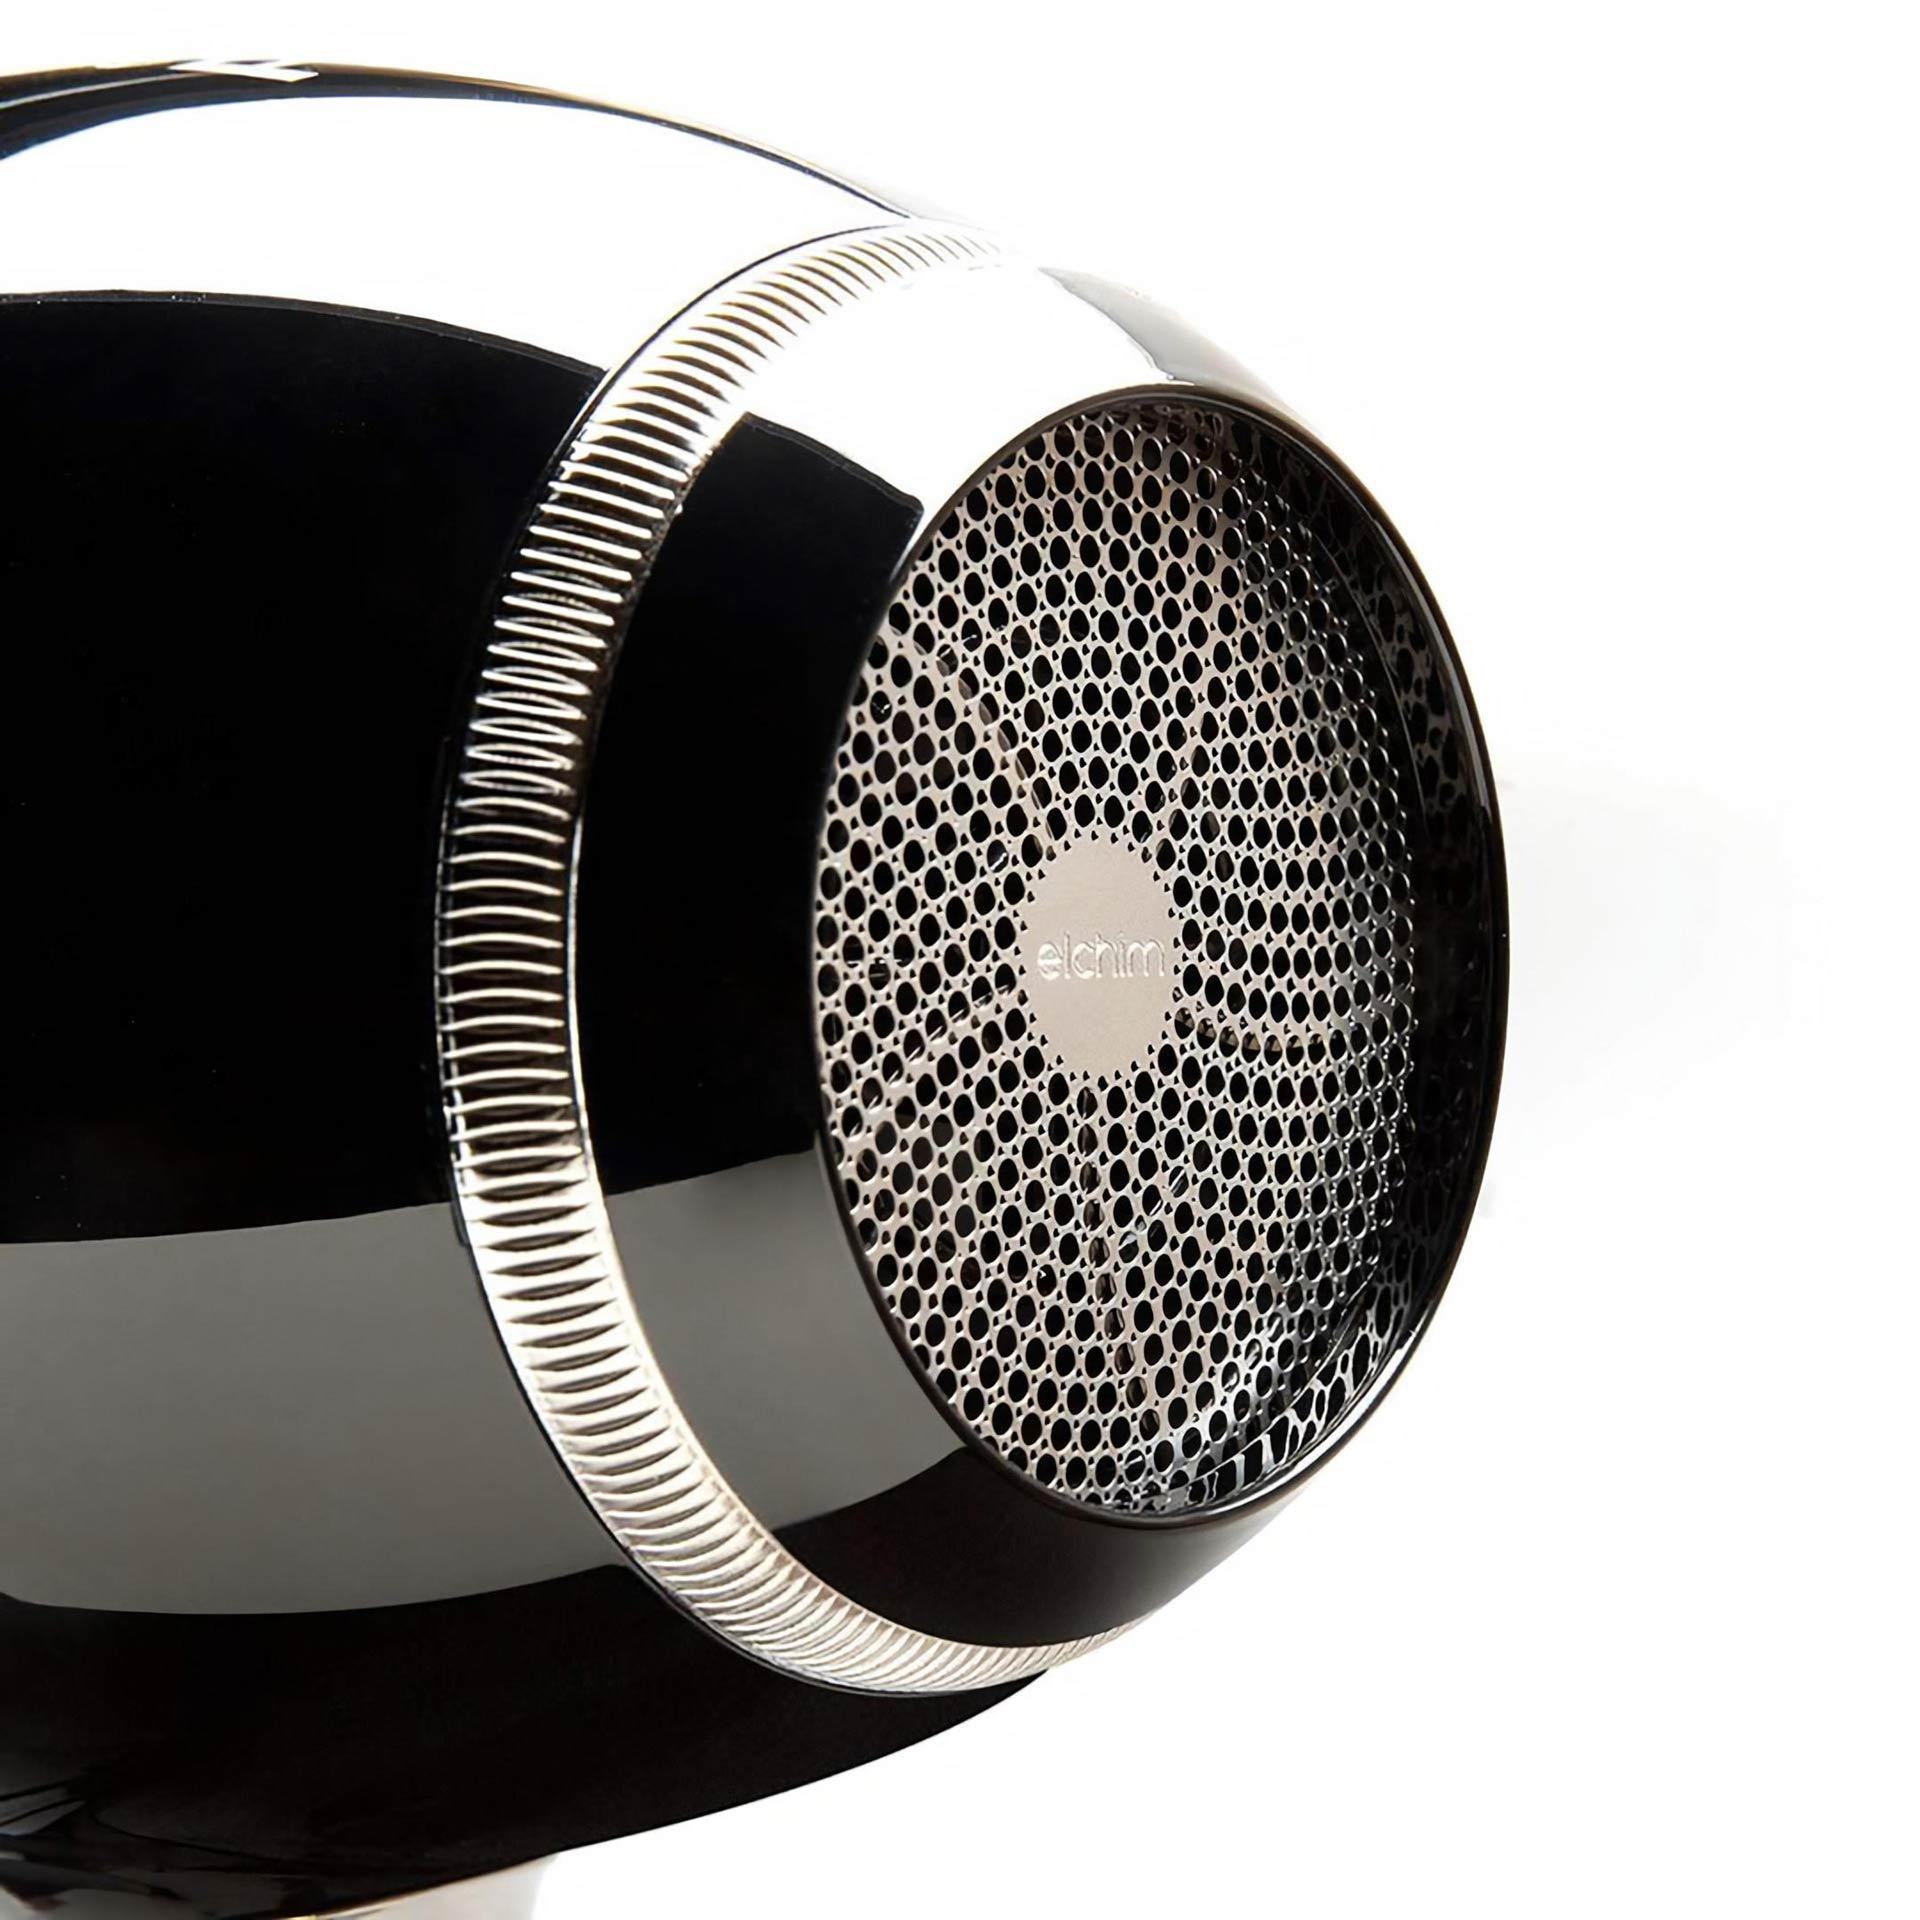 Hairdryer Design Elchim RUN disegnato da CASINI STUDIO INDUSTRIAL DESIGN dettaglio ghiera filtro